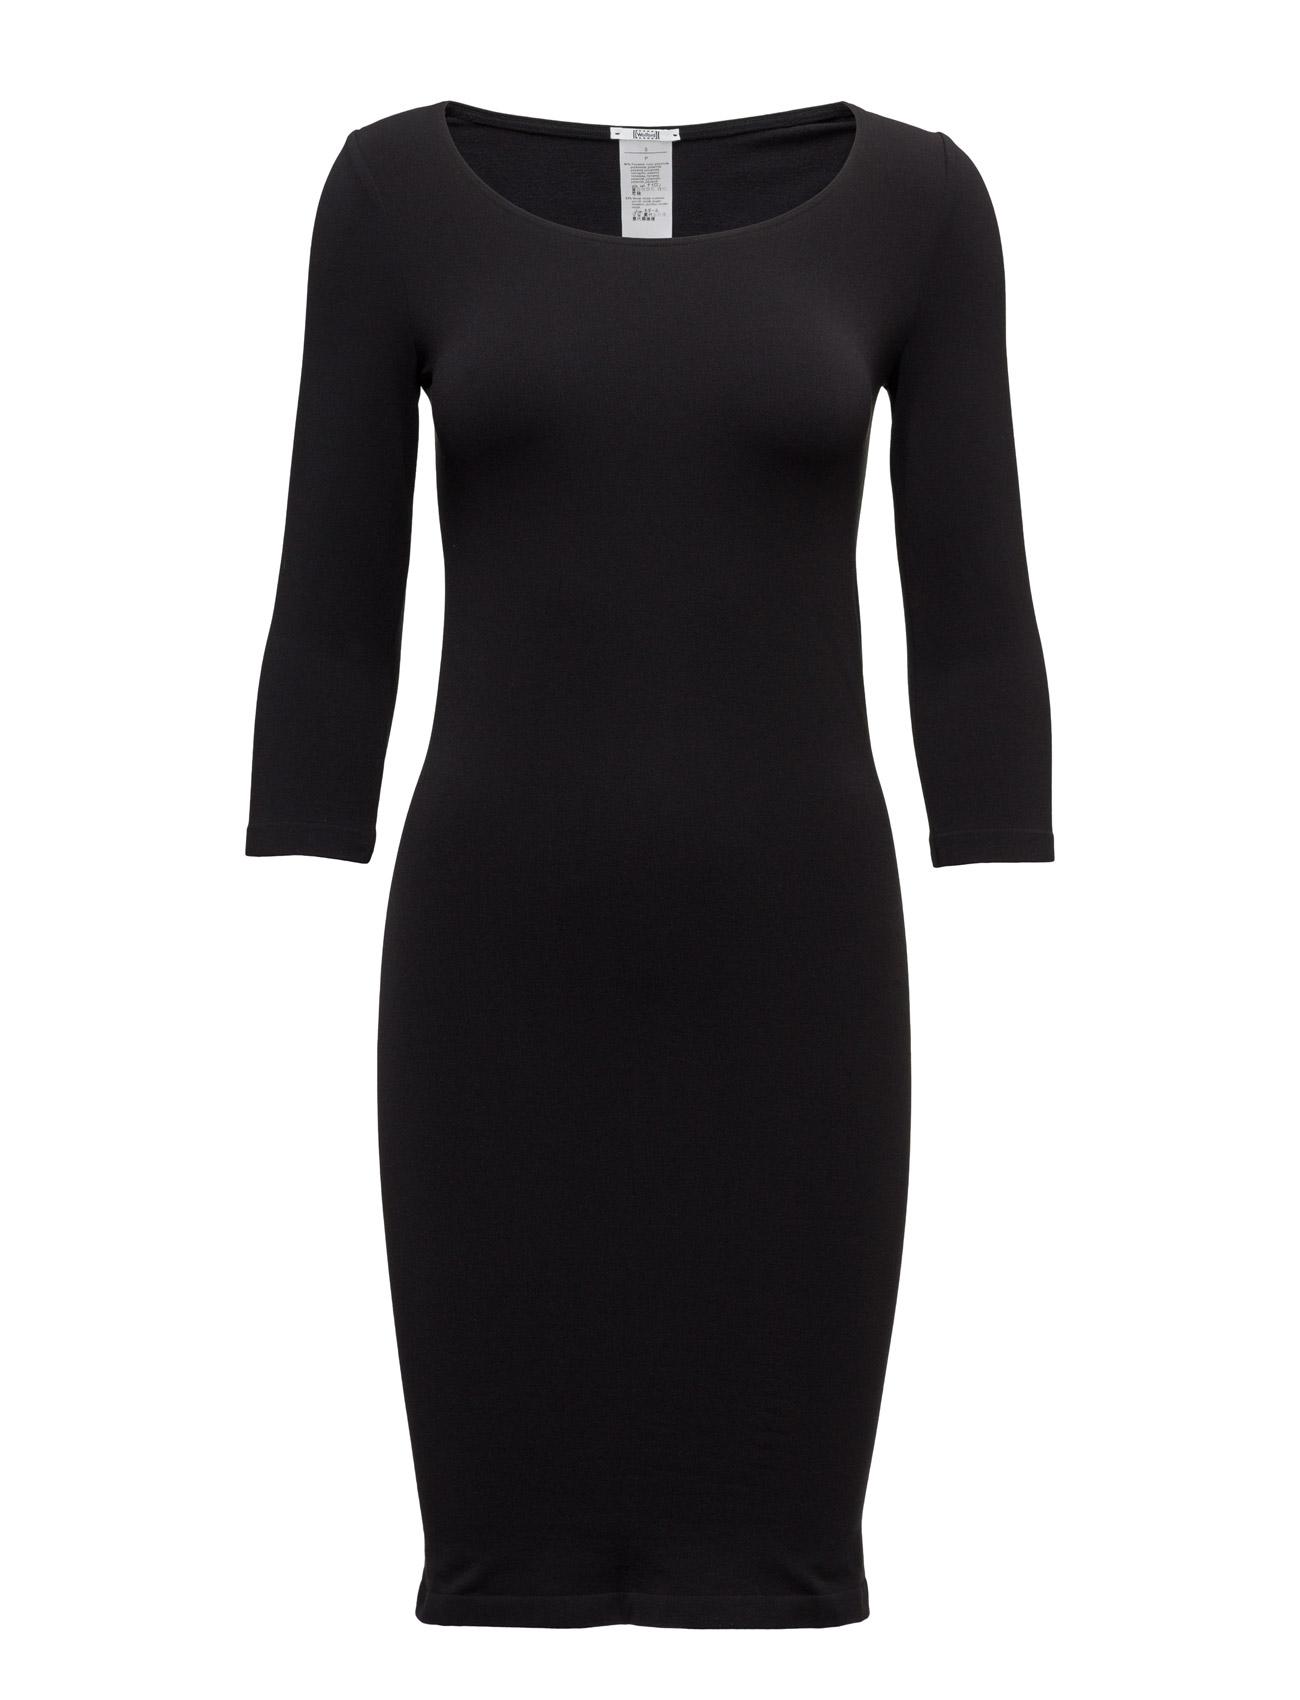 Barcelona Dress Wolford Kne & Medium til  - MoteJakten.no